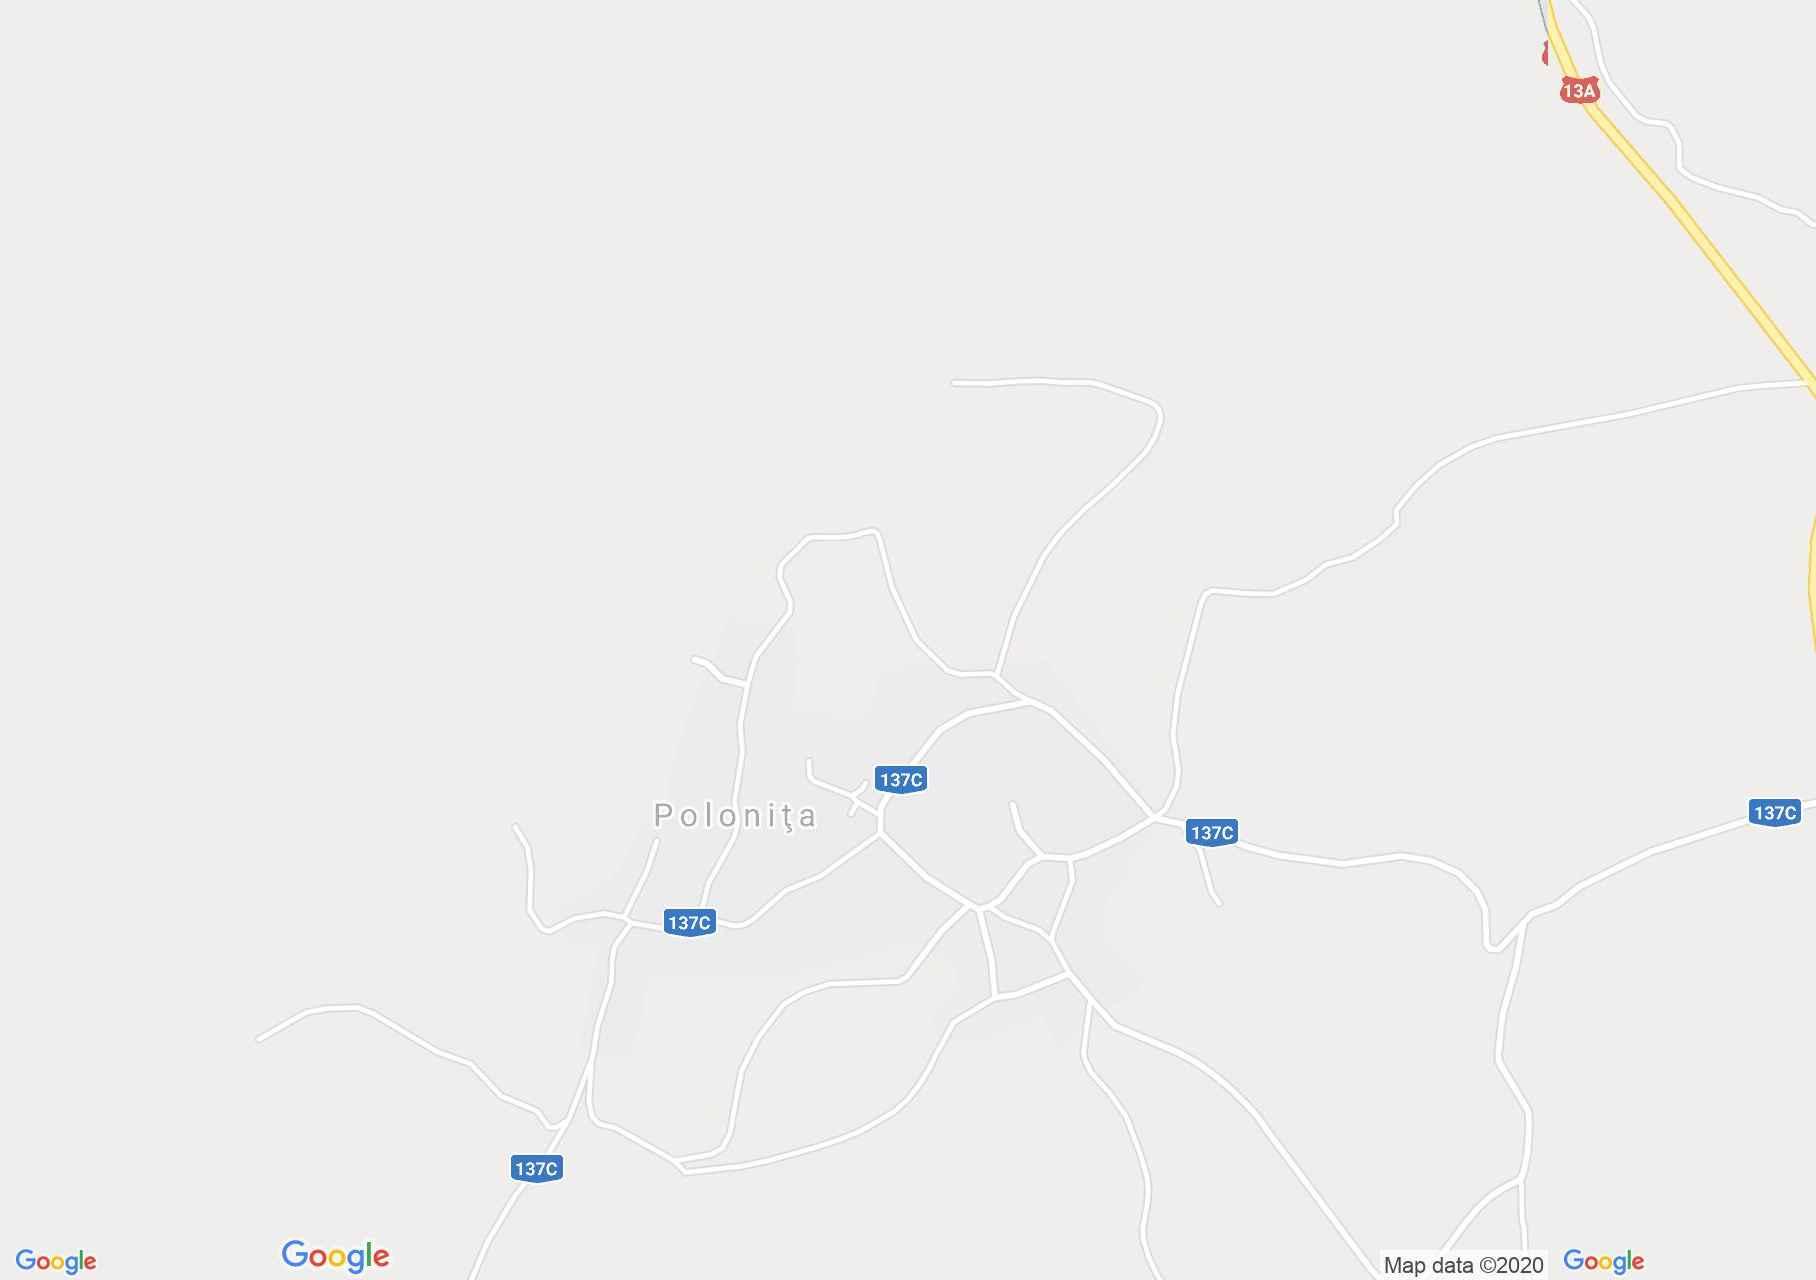 Map of Poloniţa: Catholic school